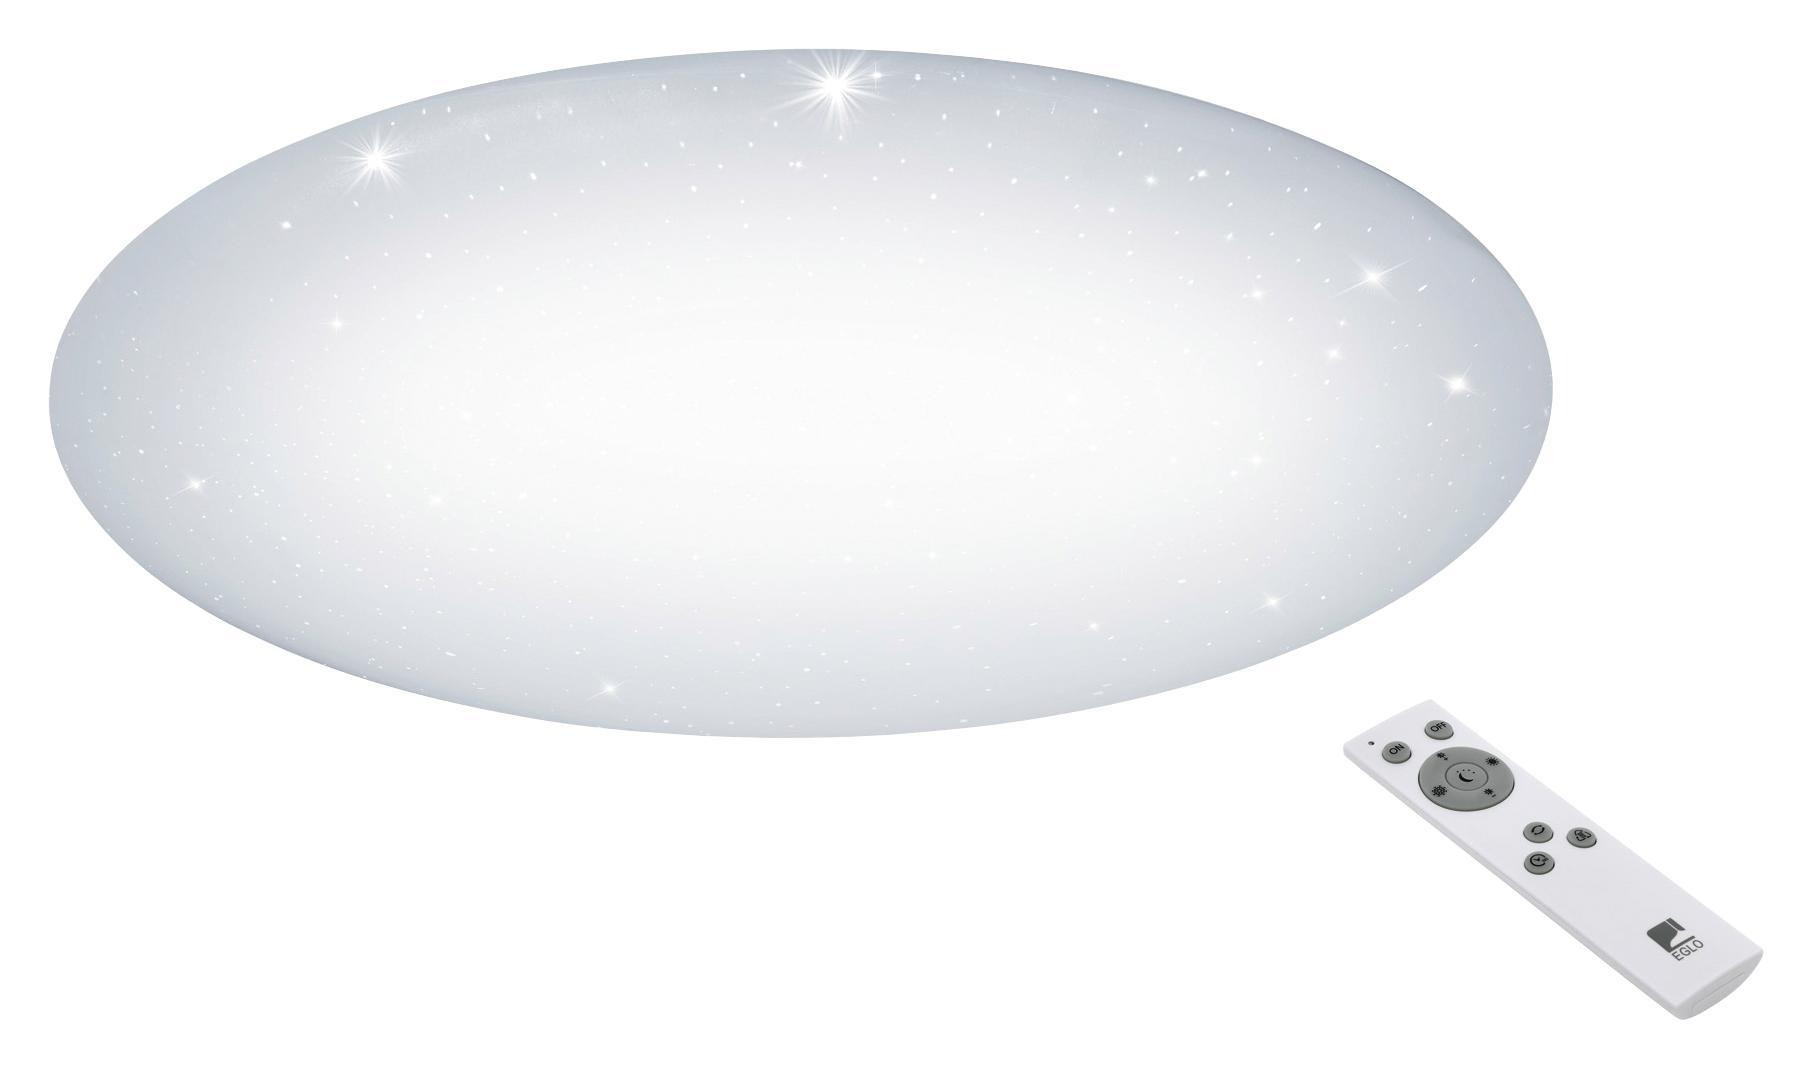 LED Deckenleuchte Sedona | Led deckenleuchte, Led, Lampen